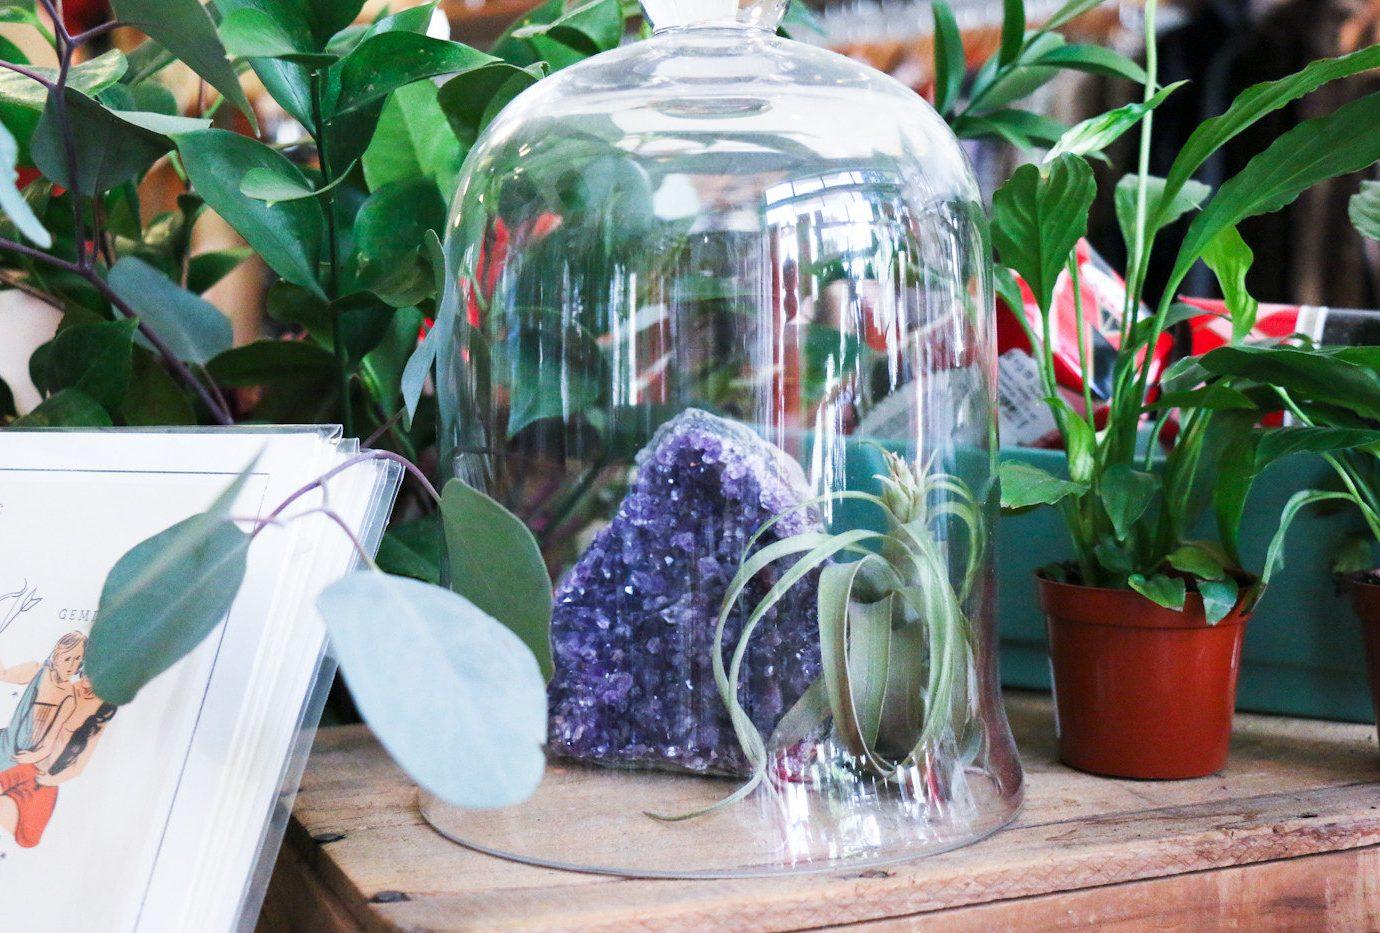 artistic artsy Boutique decor detail Hip hipster interior plants Shop shopping store Style + Design trendy table green plant floristry flower spring Garden glass bell jar fresh